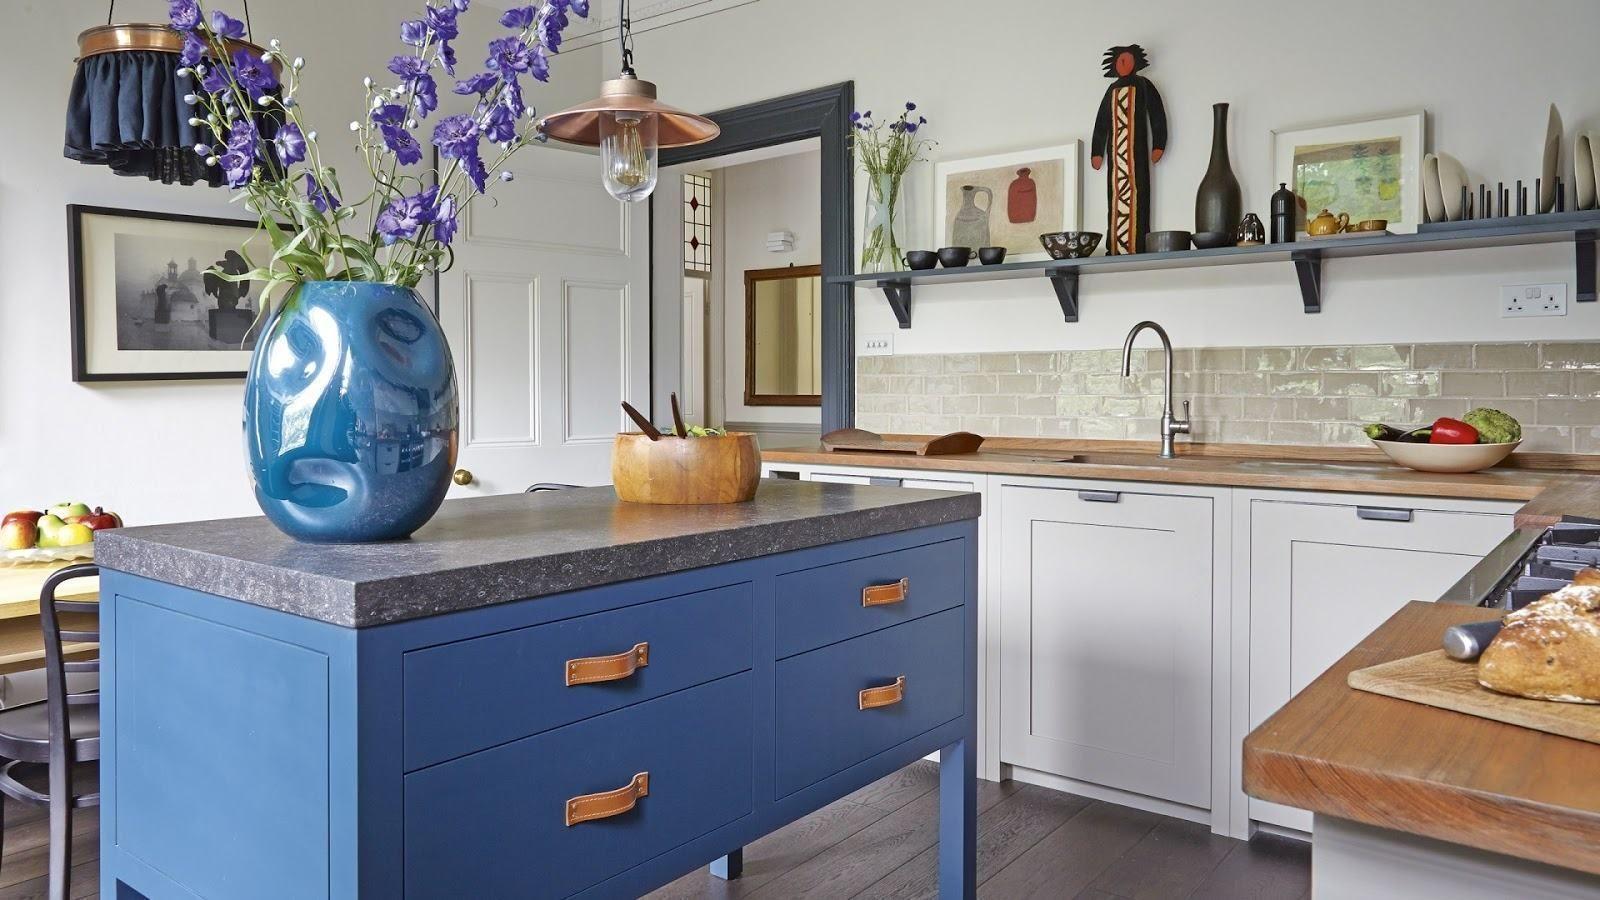 Cozinha Azul 70 Inspiracoes De Decoracao Com A Cor Freestanding Kitchen Country Kitchen Painted Kitchen Island